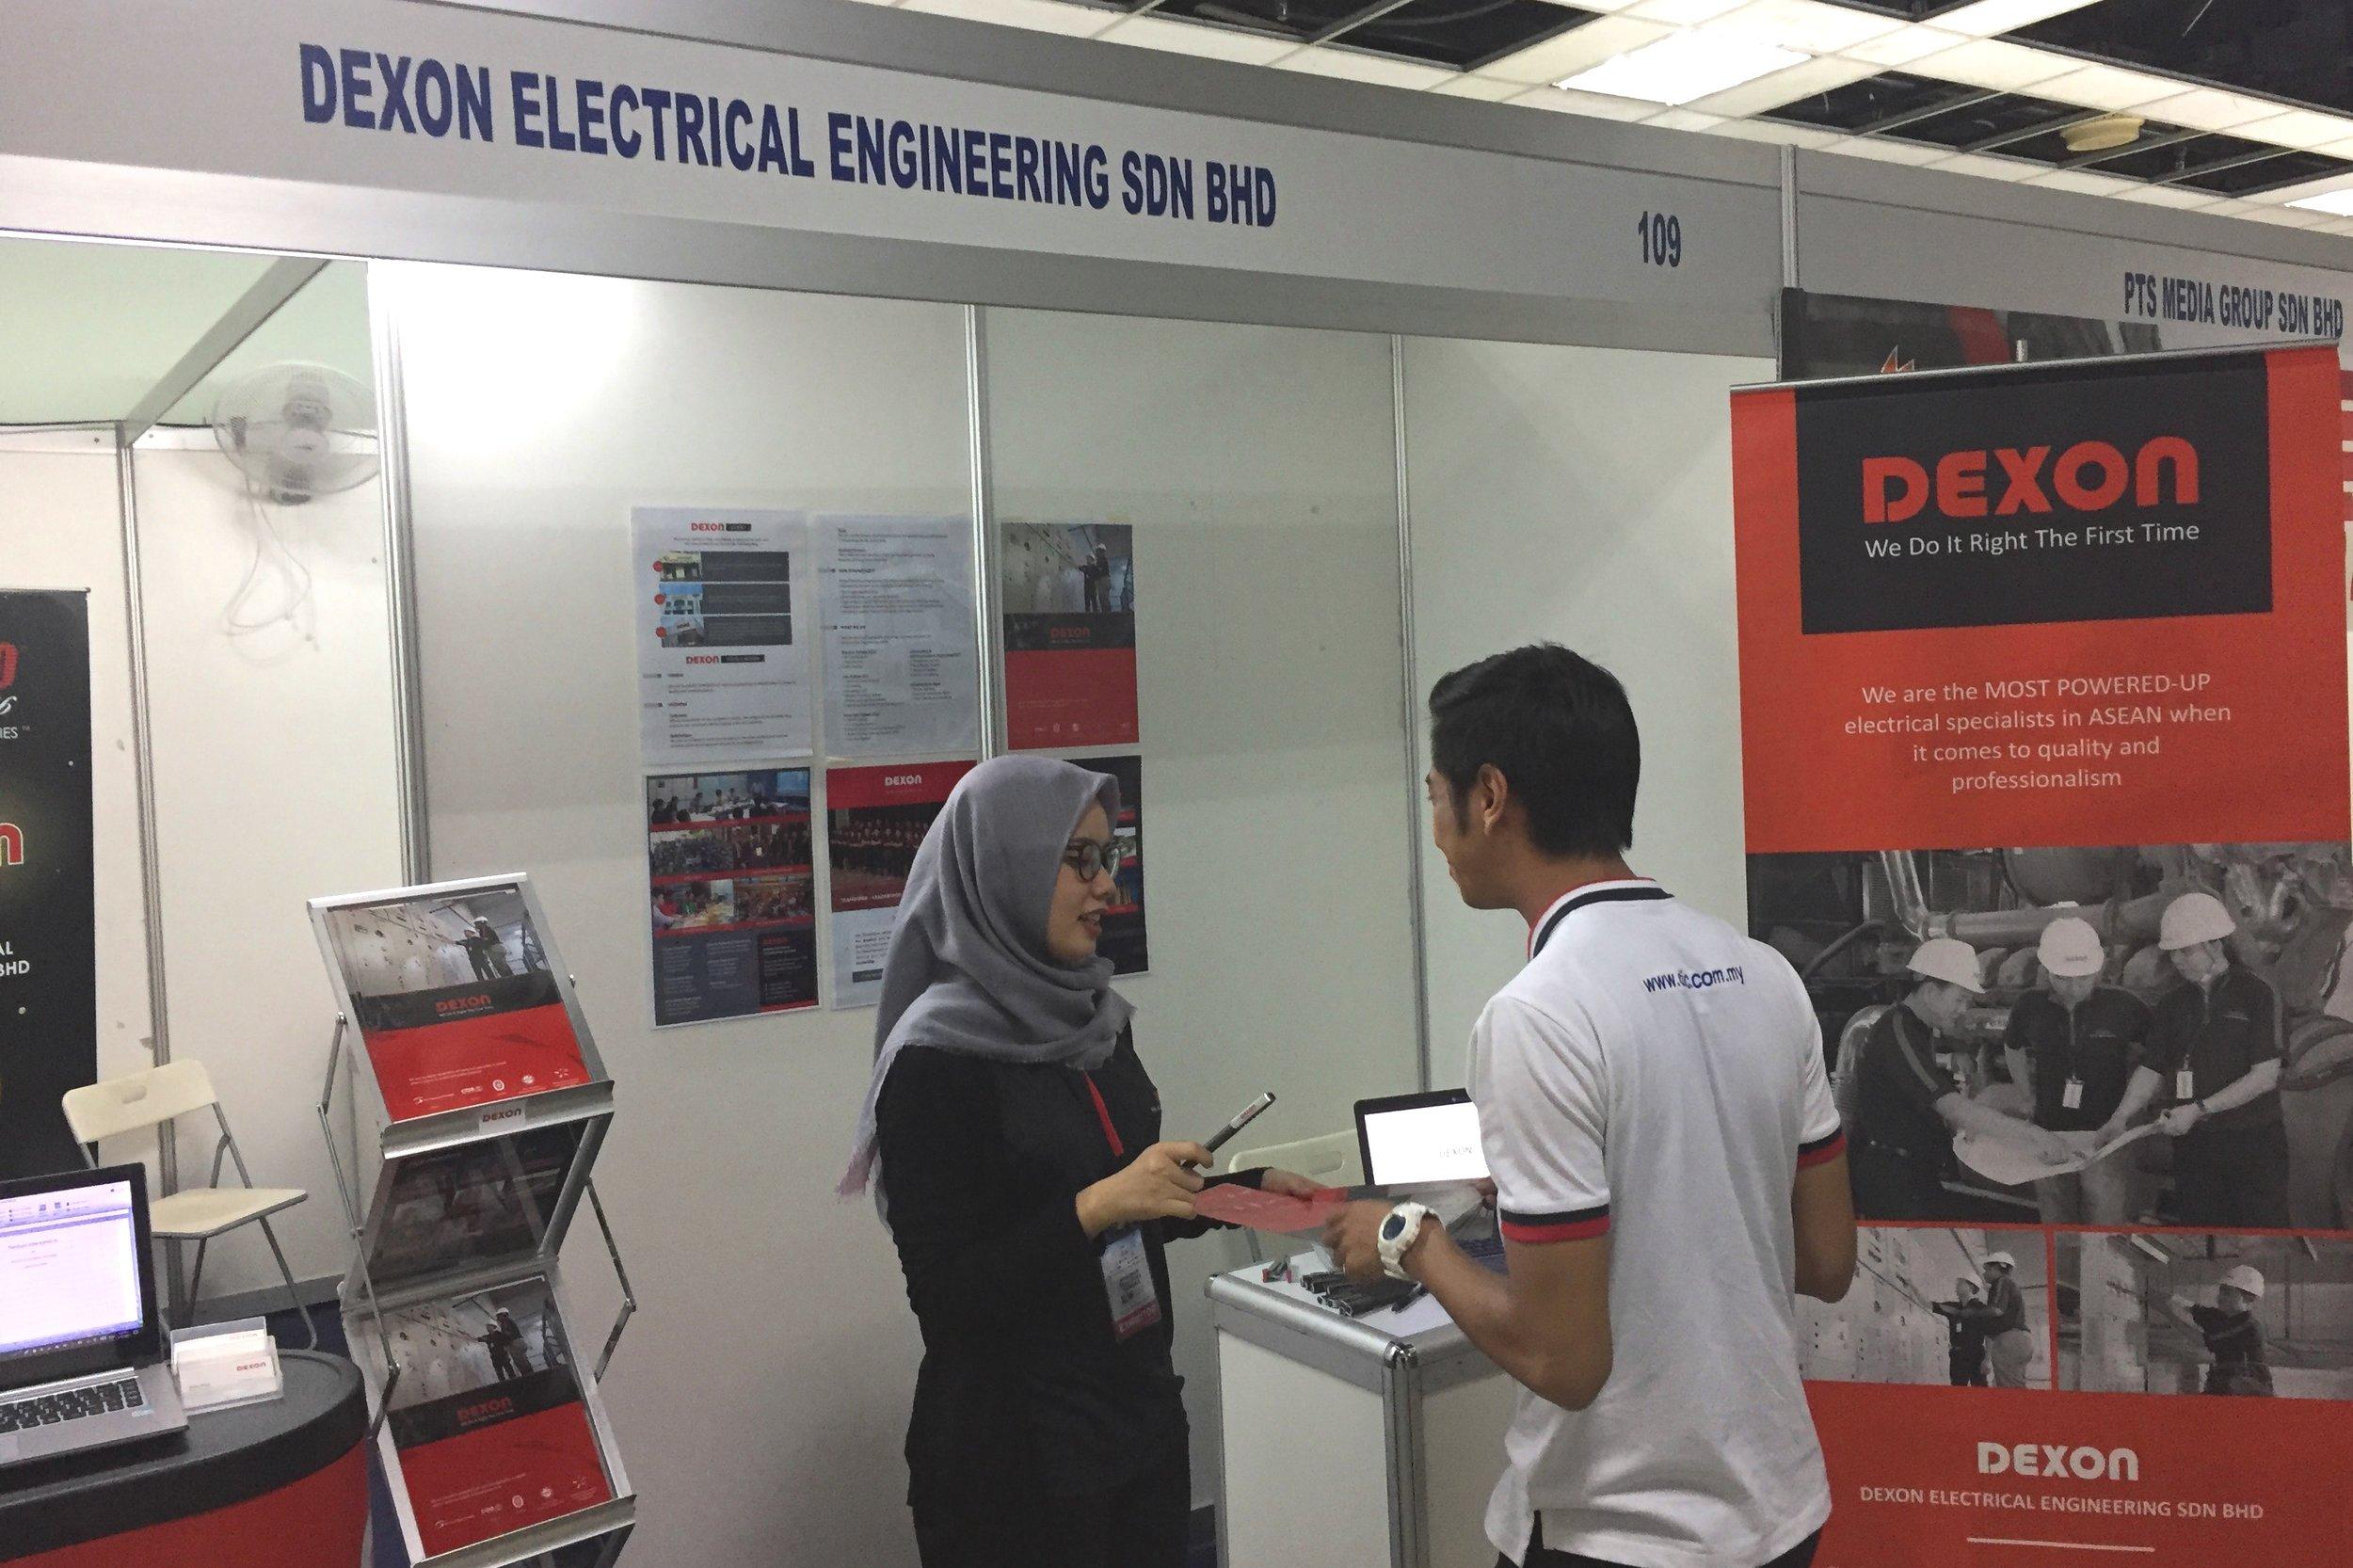 electrical-engineering-dexon-SL1M-career-fair